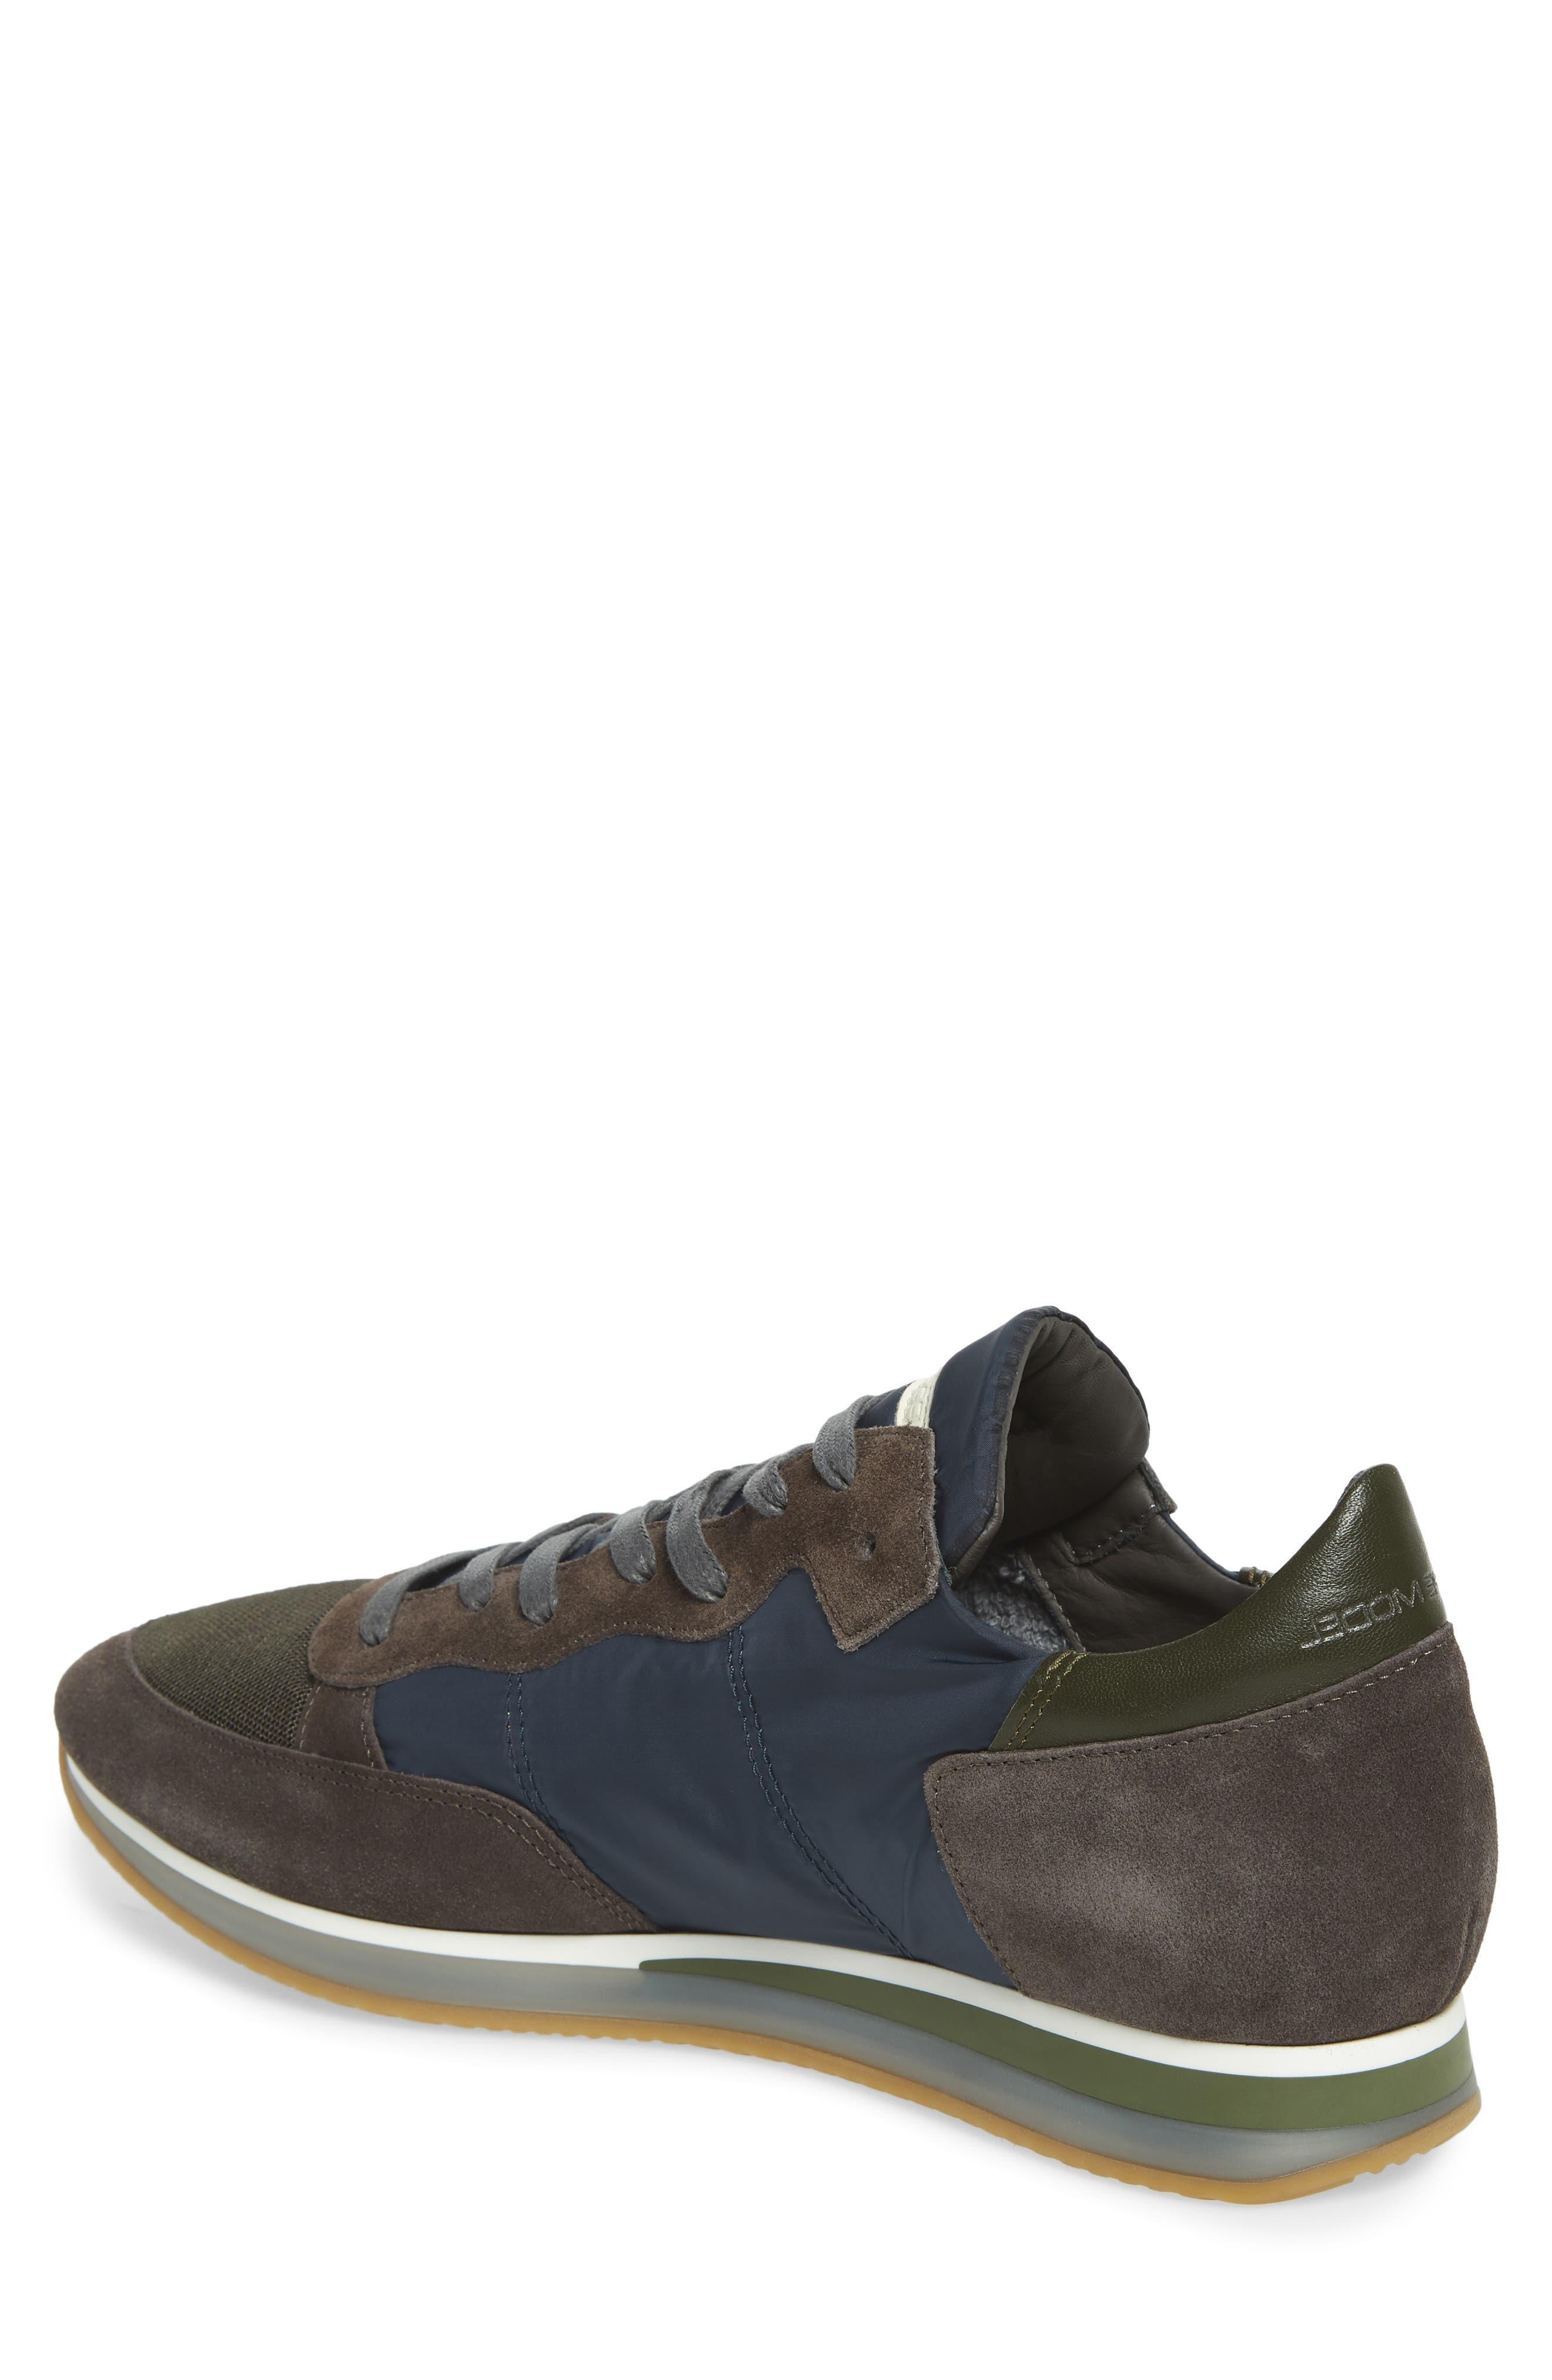 Tropez Low Top Sneaker,                             Alternate thumbnail 2, color,                             BLUE/ GREY